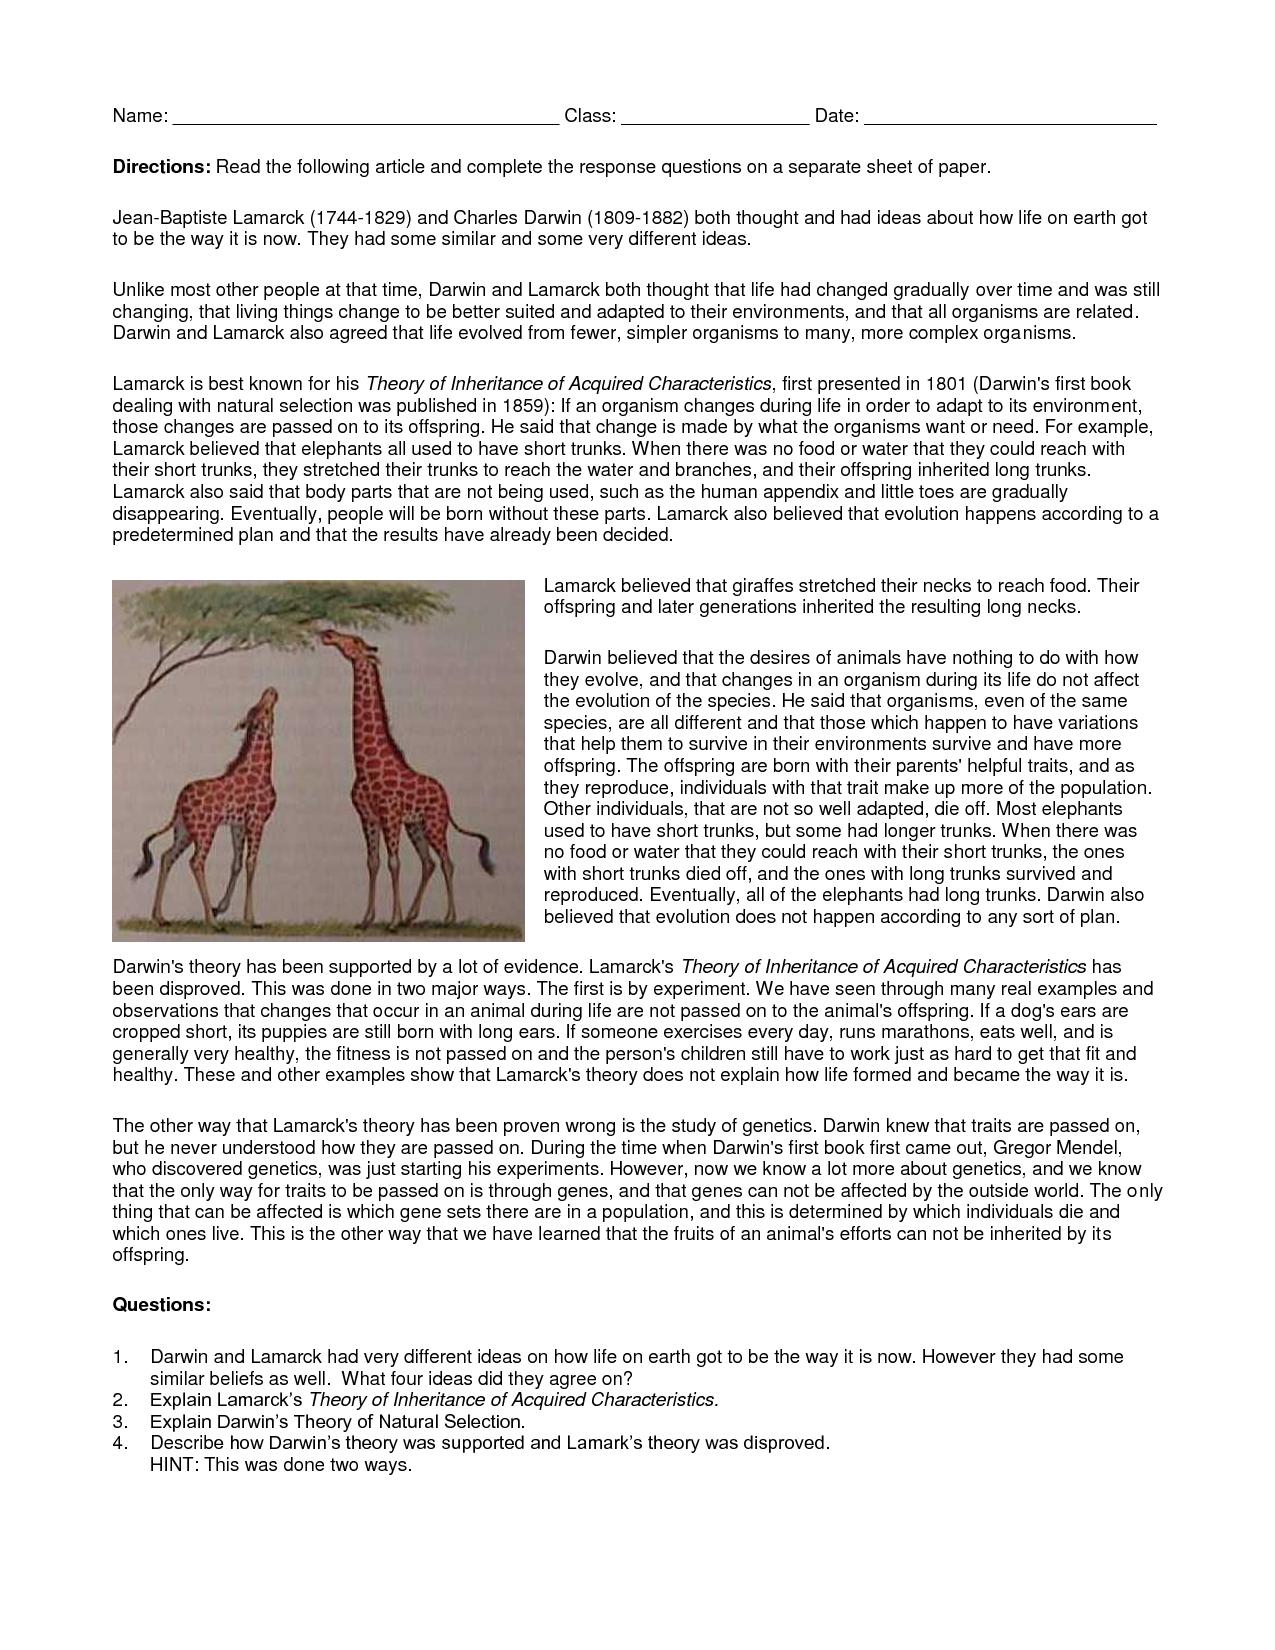 Darwin vs Lamarck | Work | Pinterest